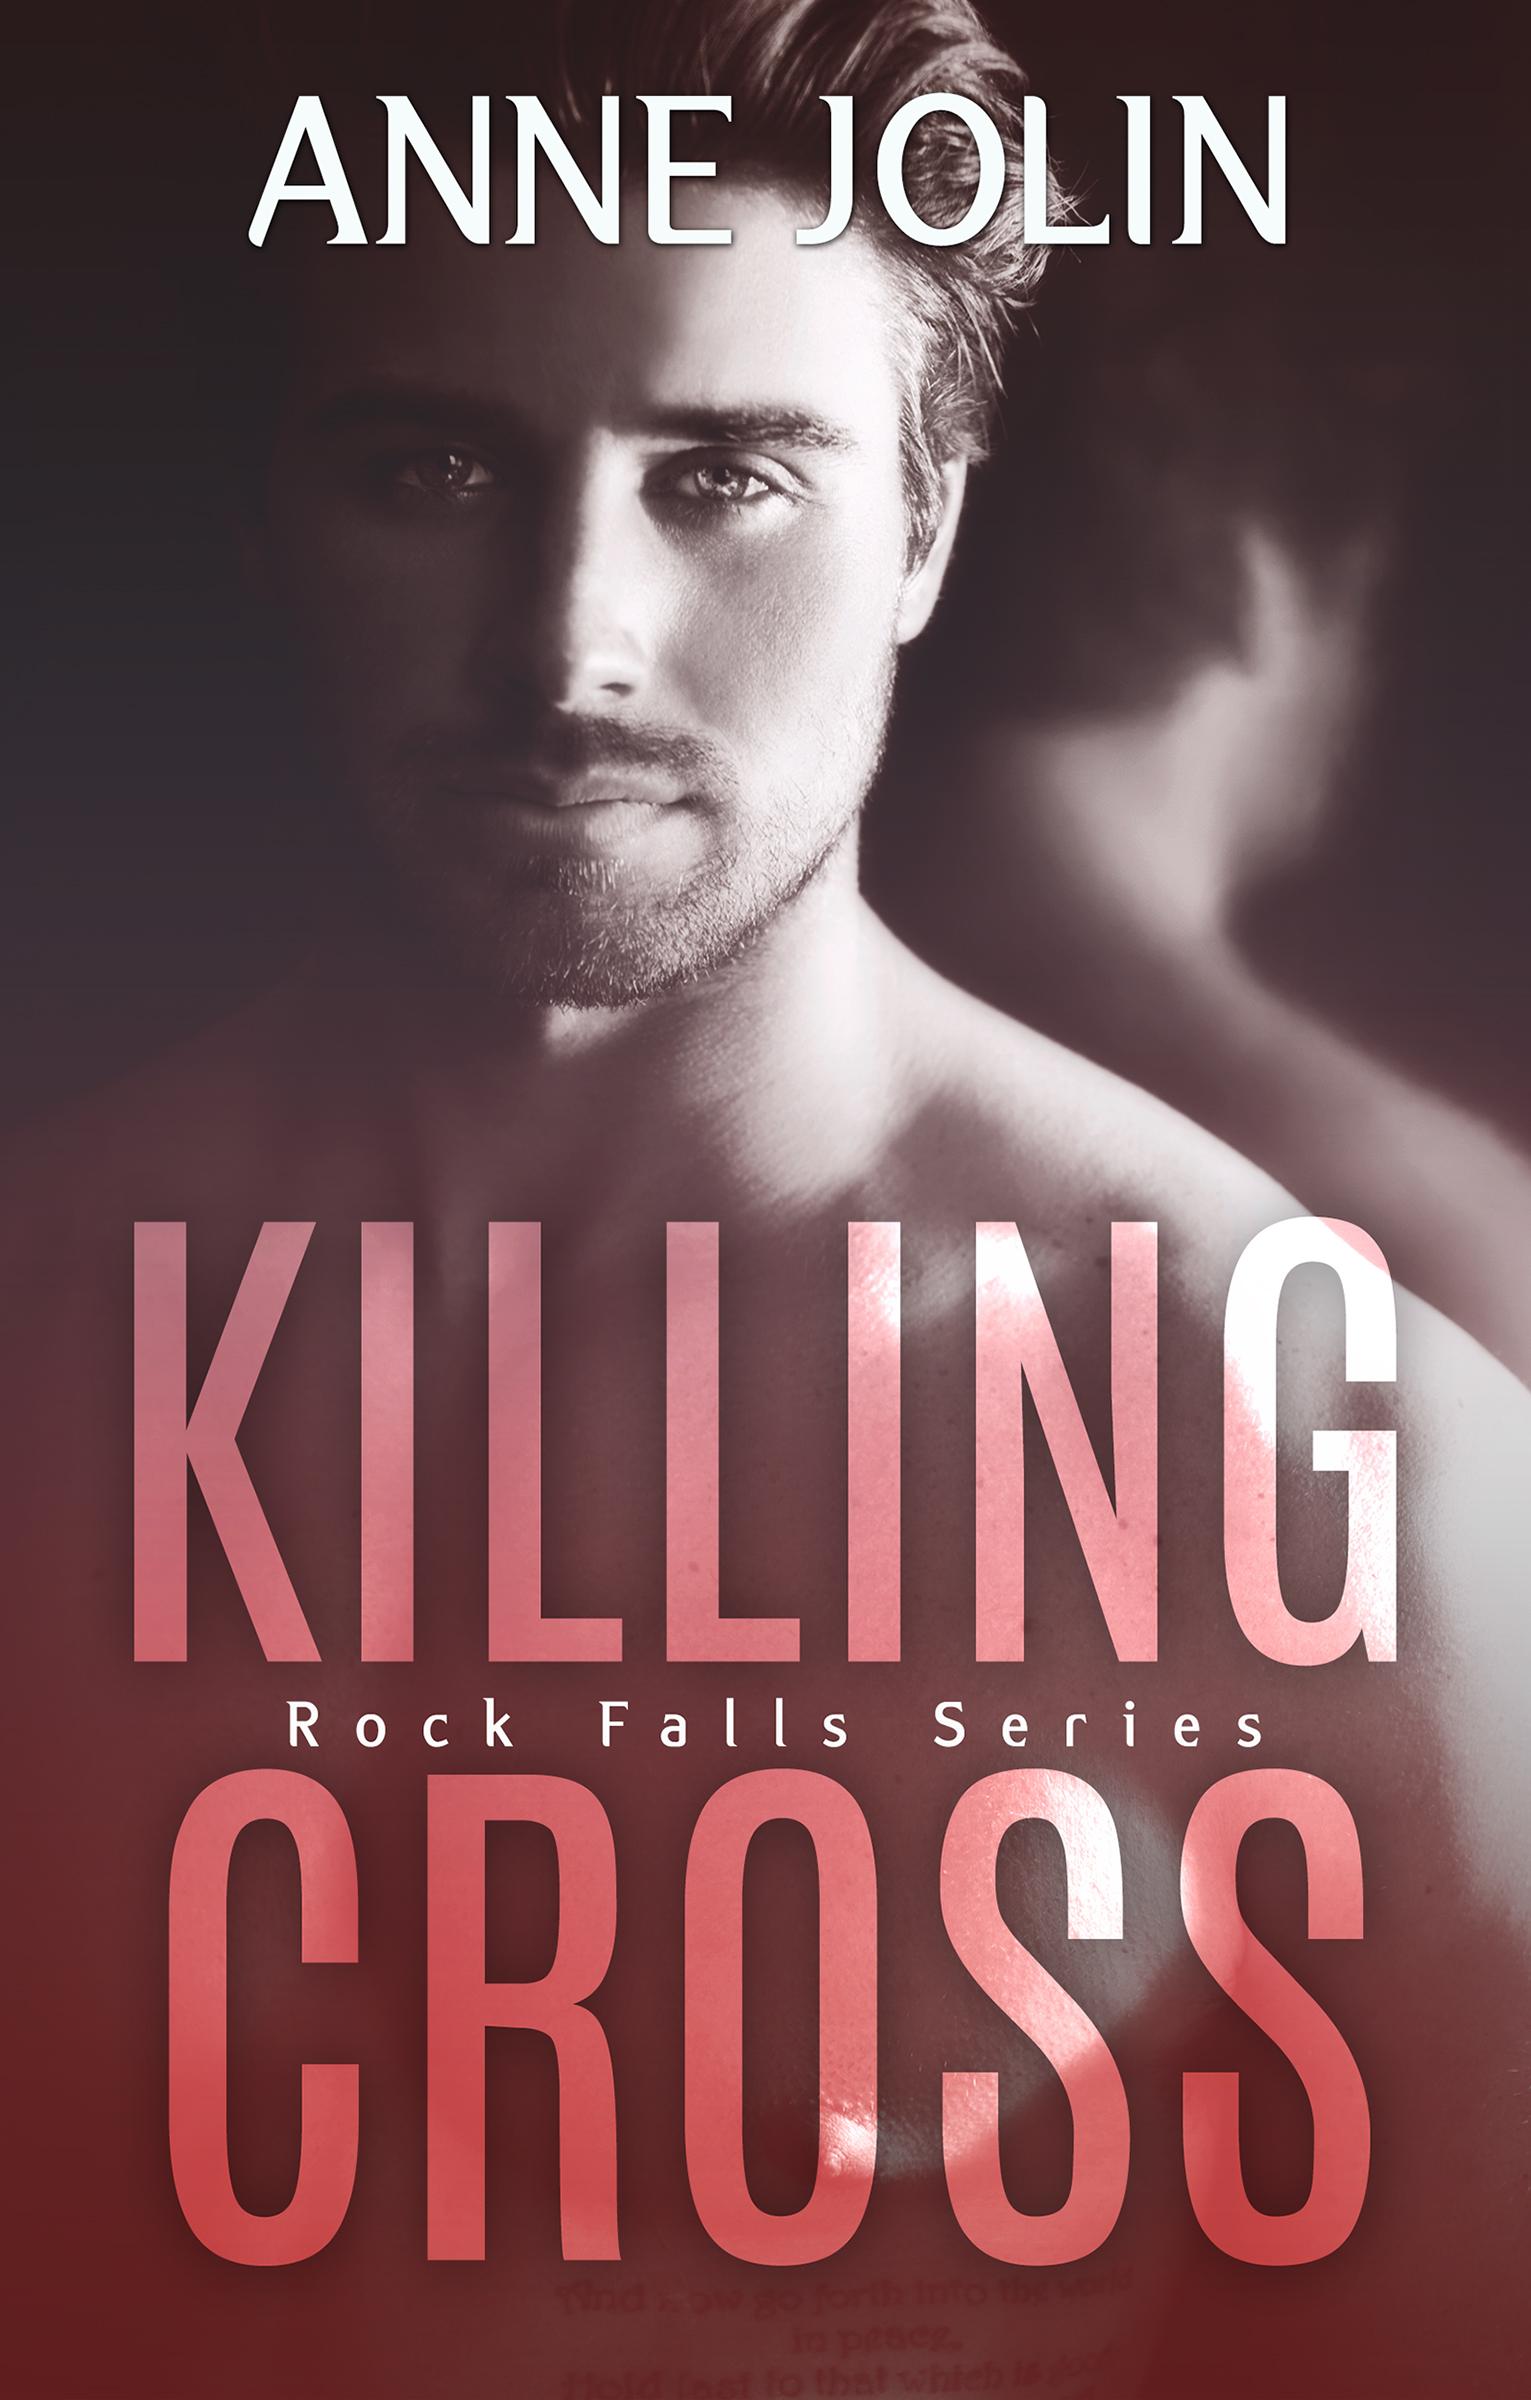 killingcross_ecover